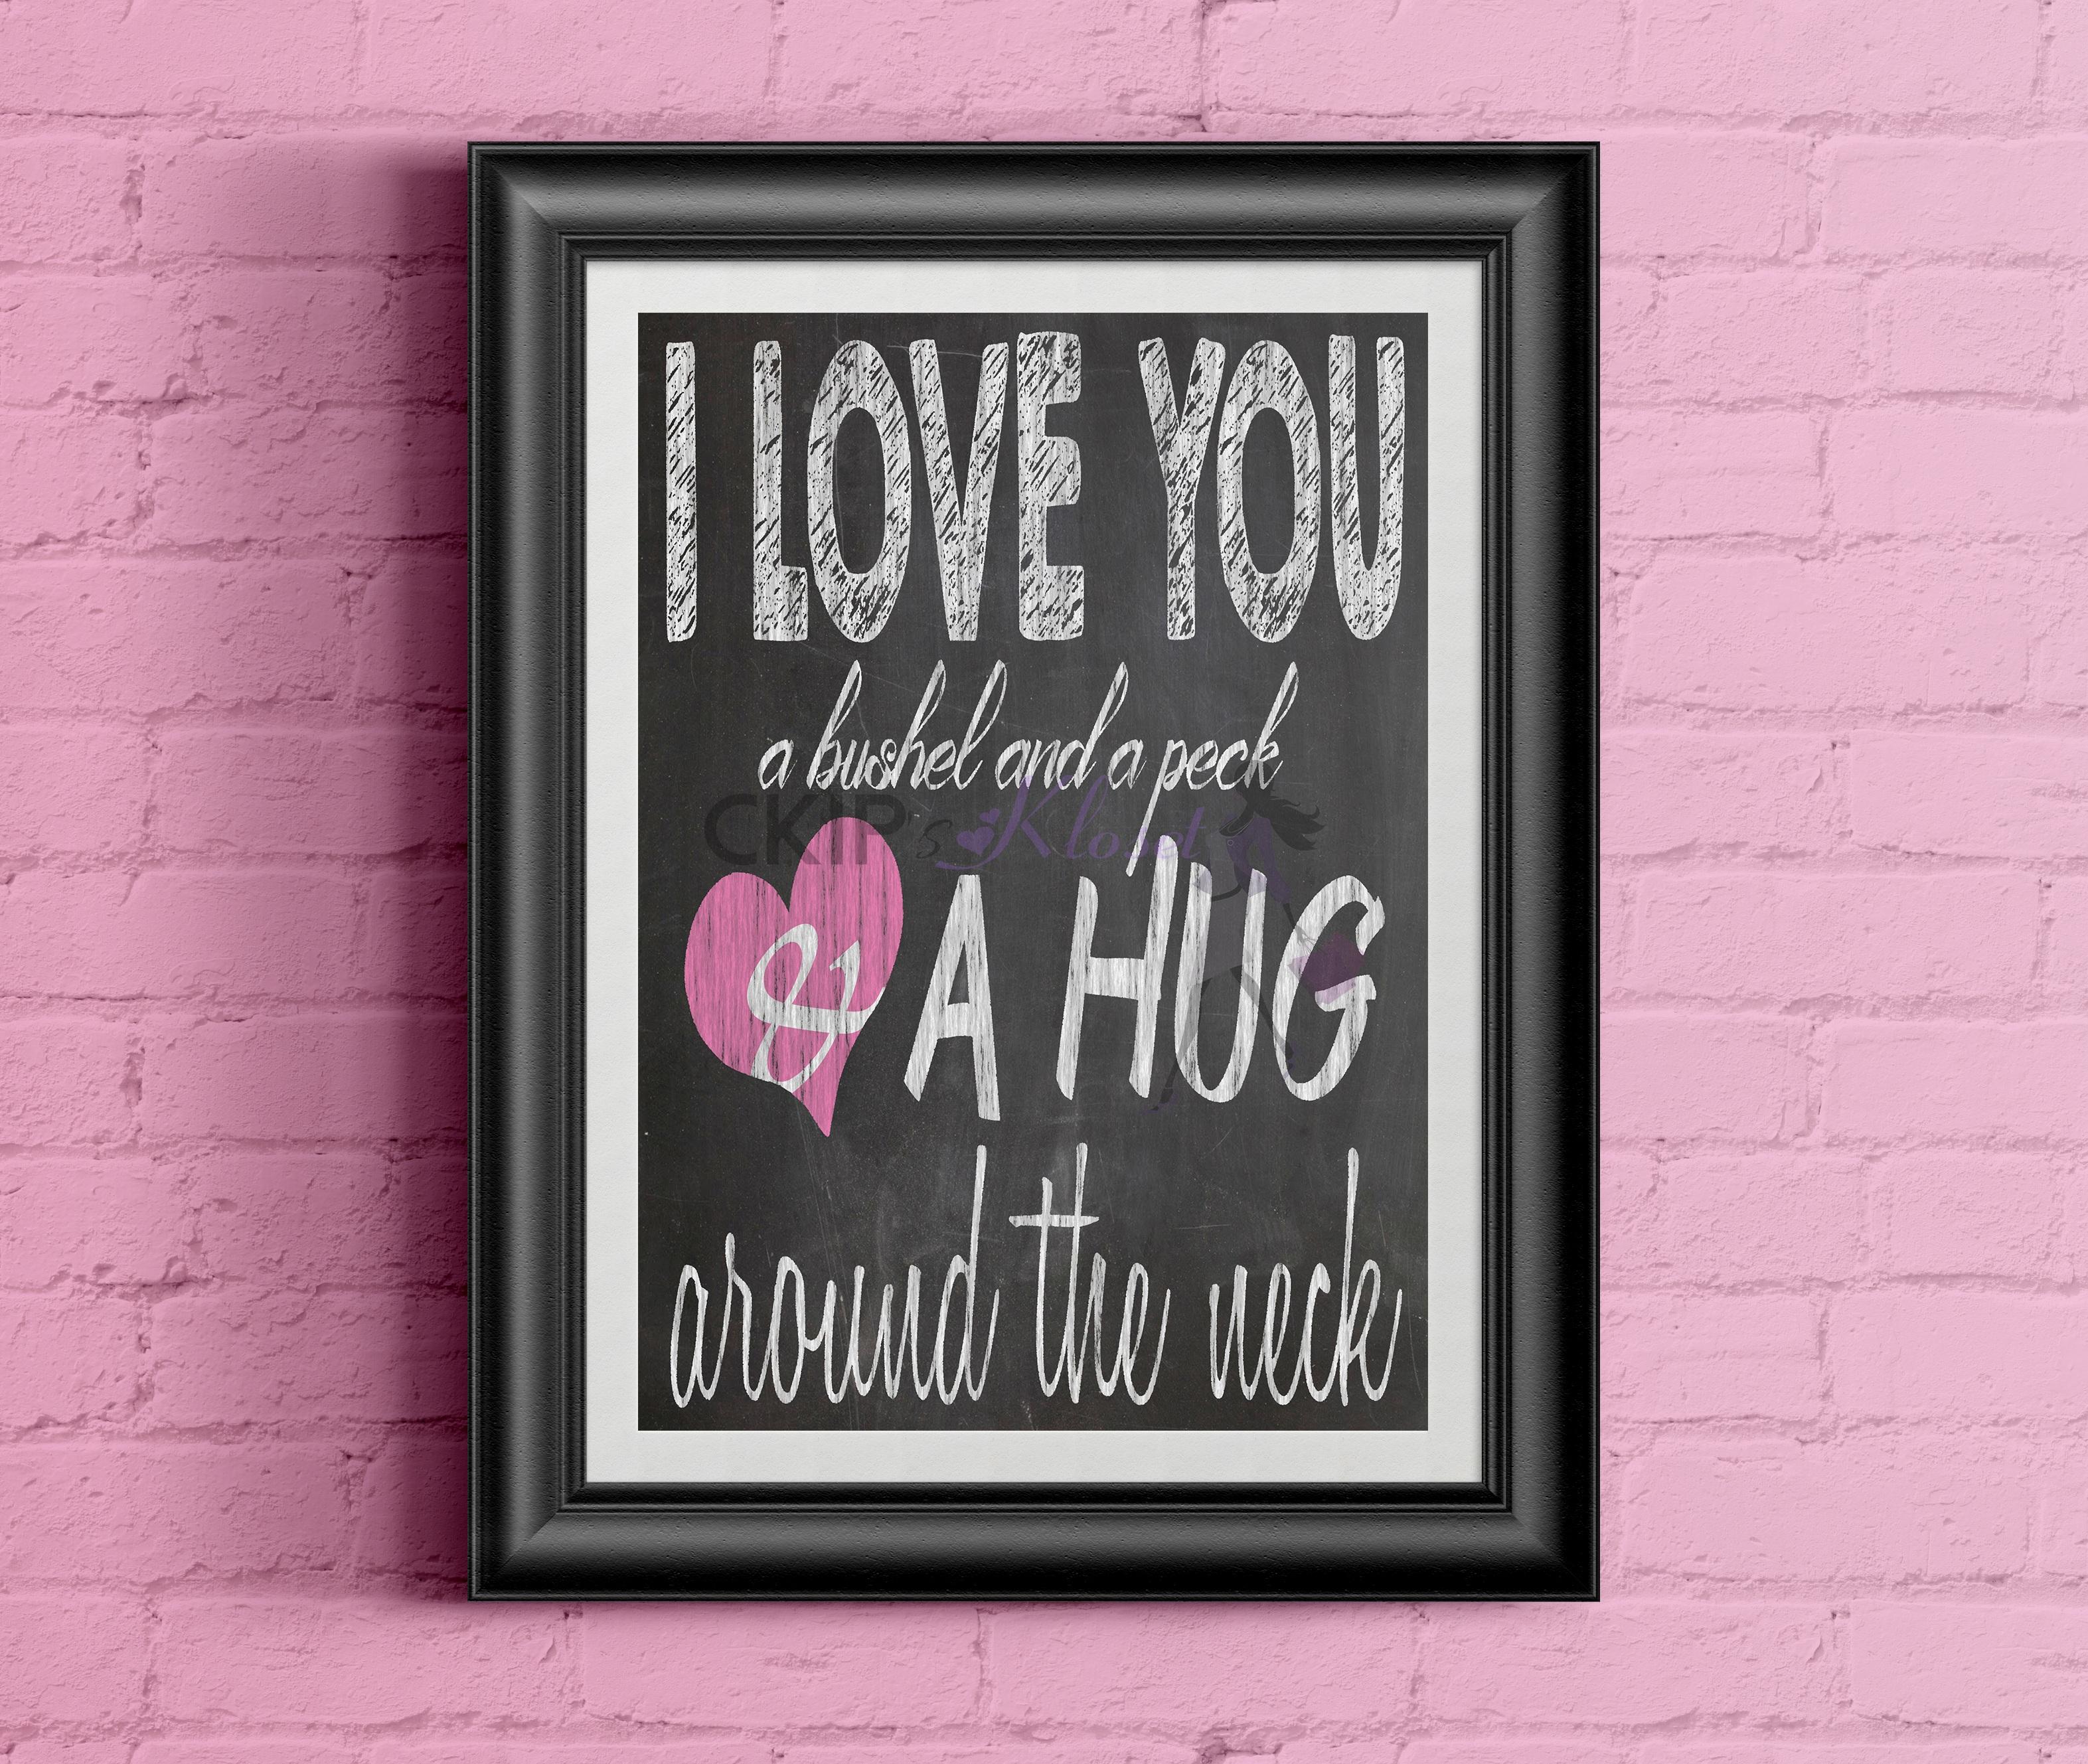 I Love You, a Bushel and a Peck, And A Hug Around The Neck ...